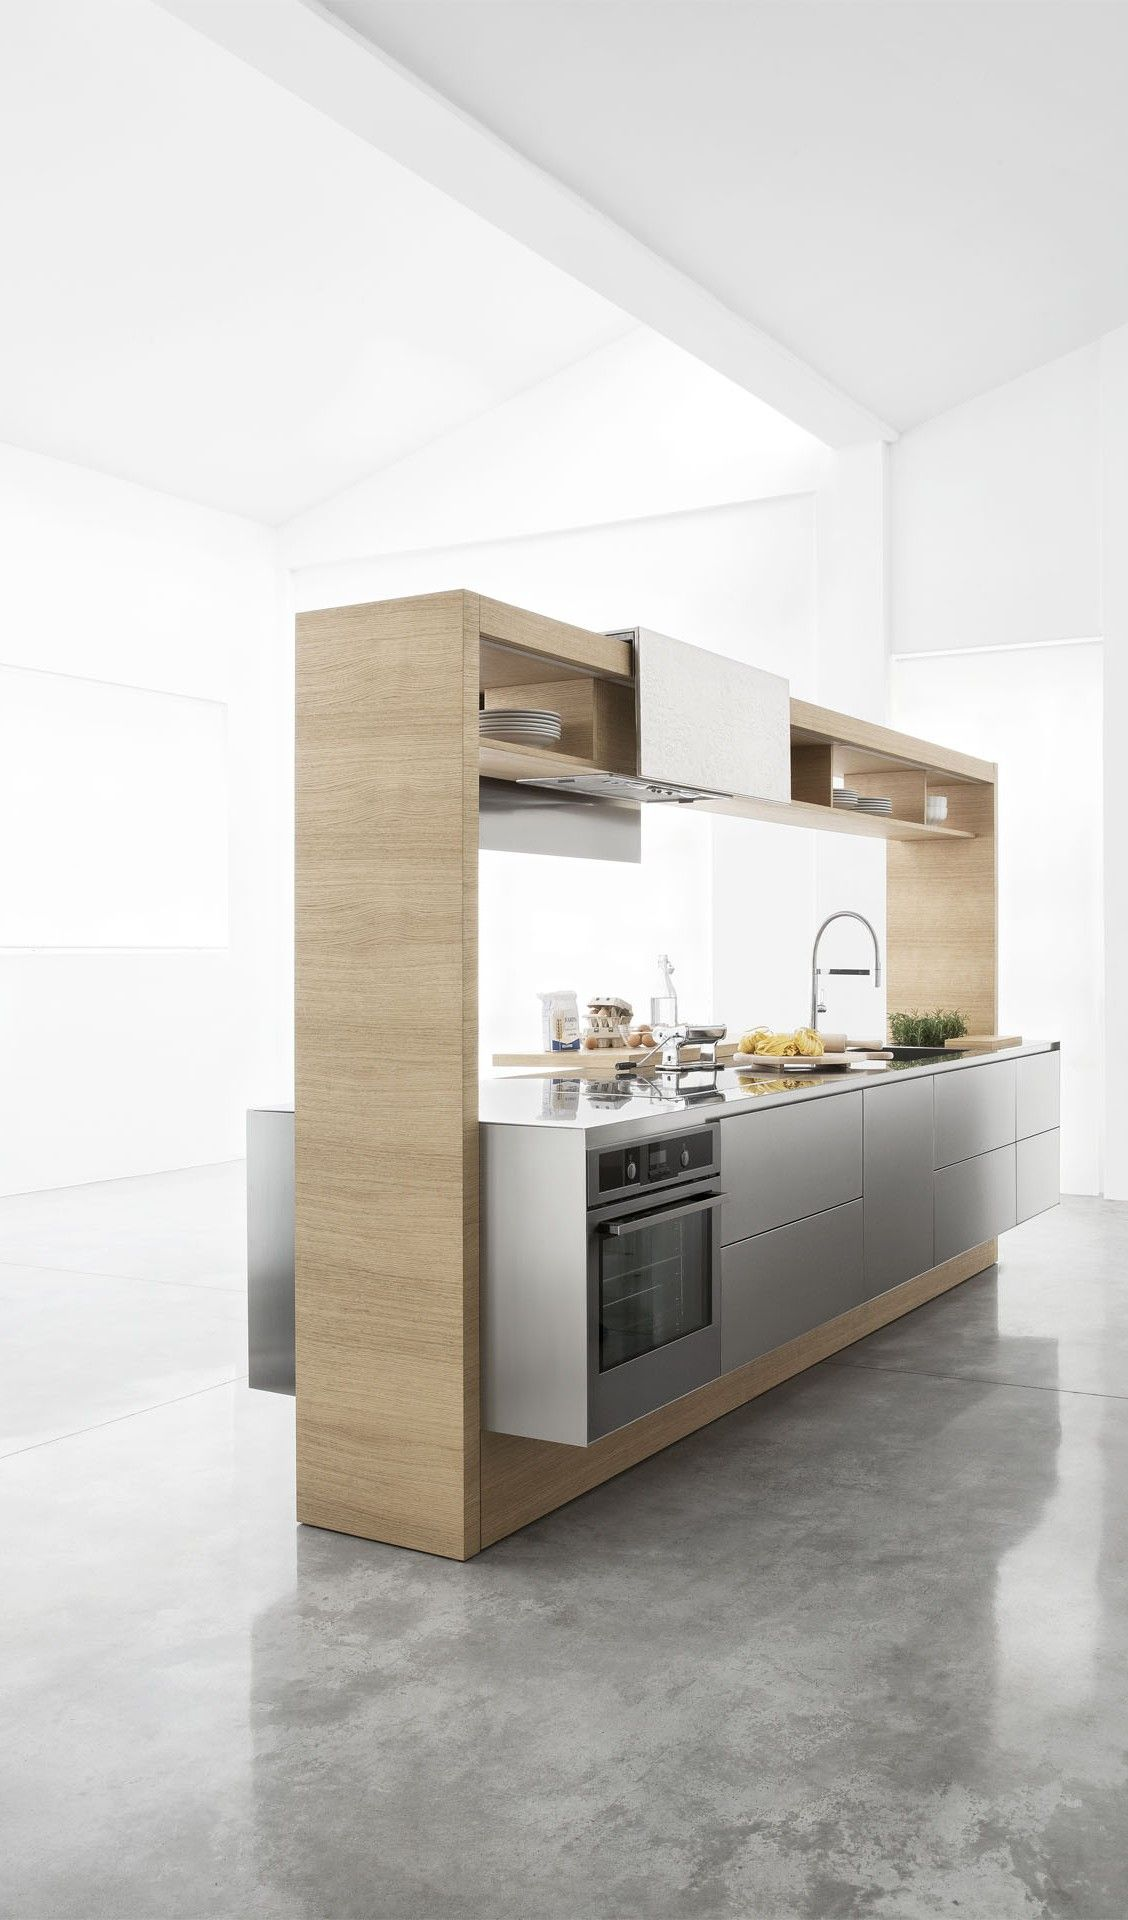 Minimalist Kitchen // The Archea freestanding modular